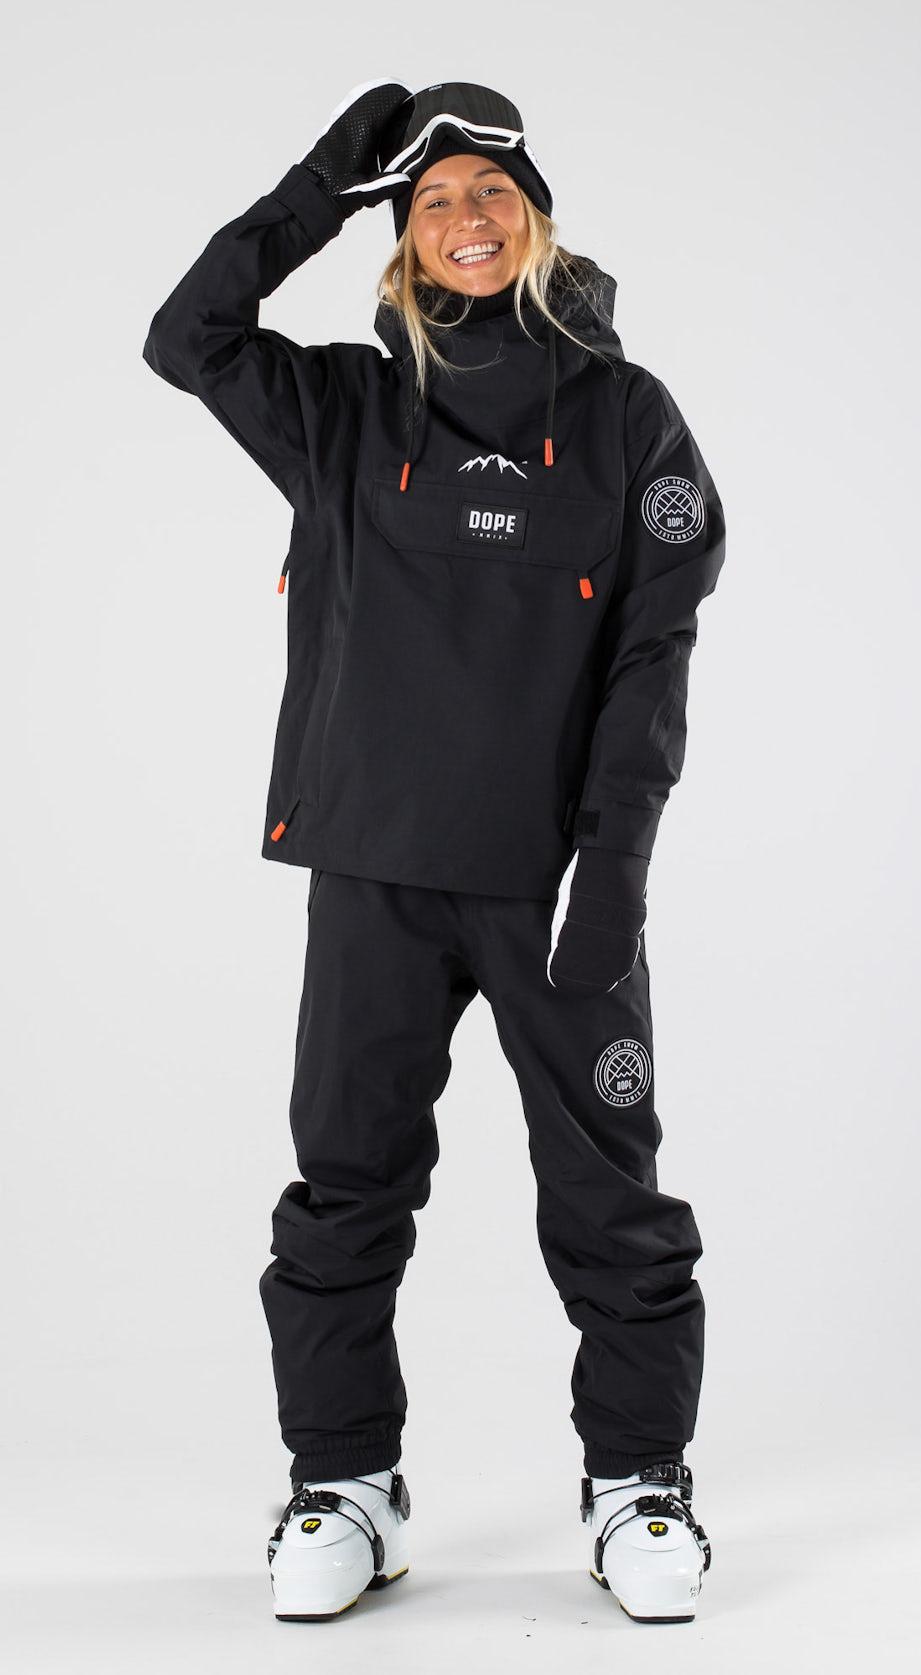 Dope Blizzard W Black Skidkläder Multi